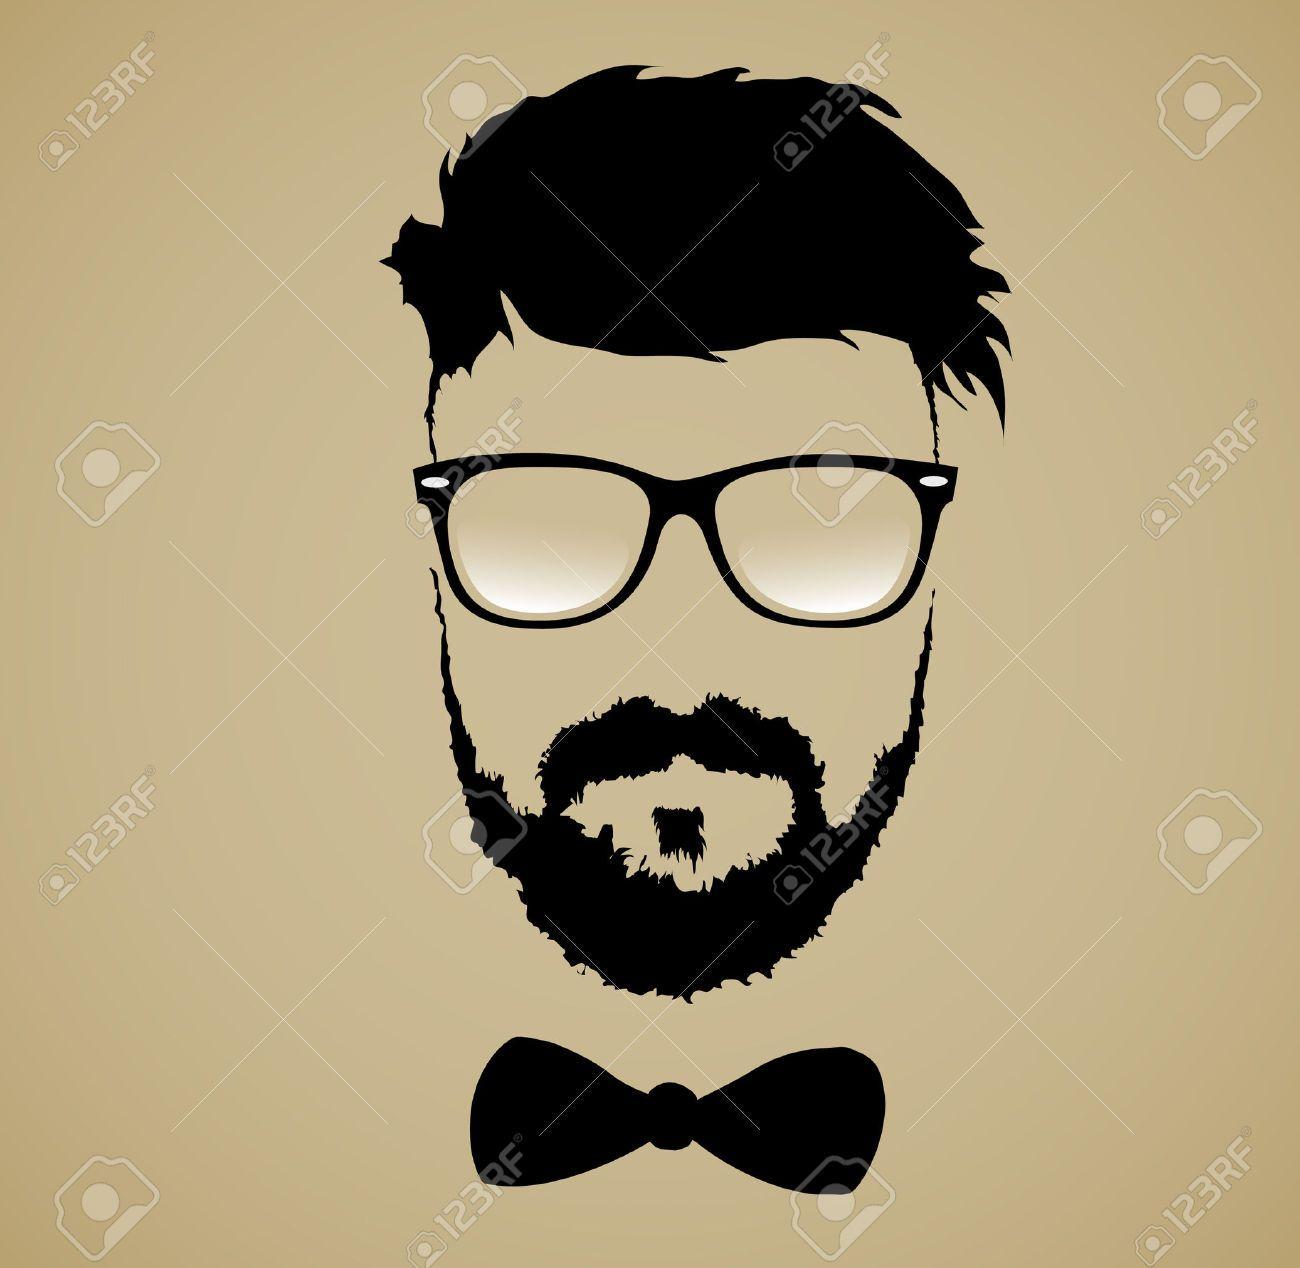 Beard clipart big beard. Mustache glasses hairstyle royalty